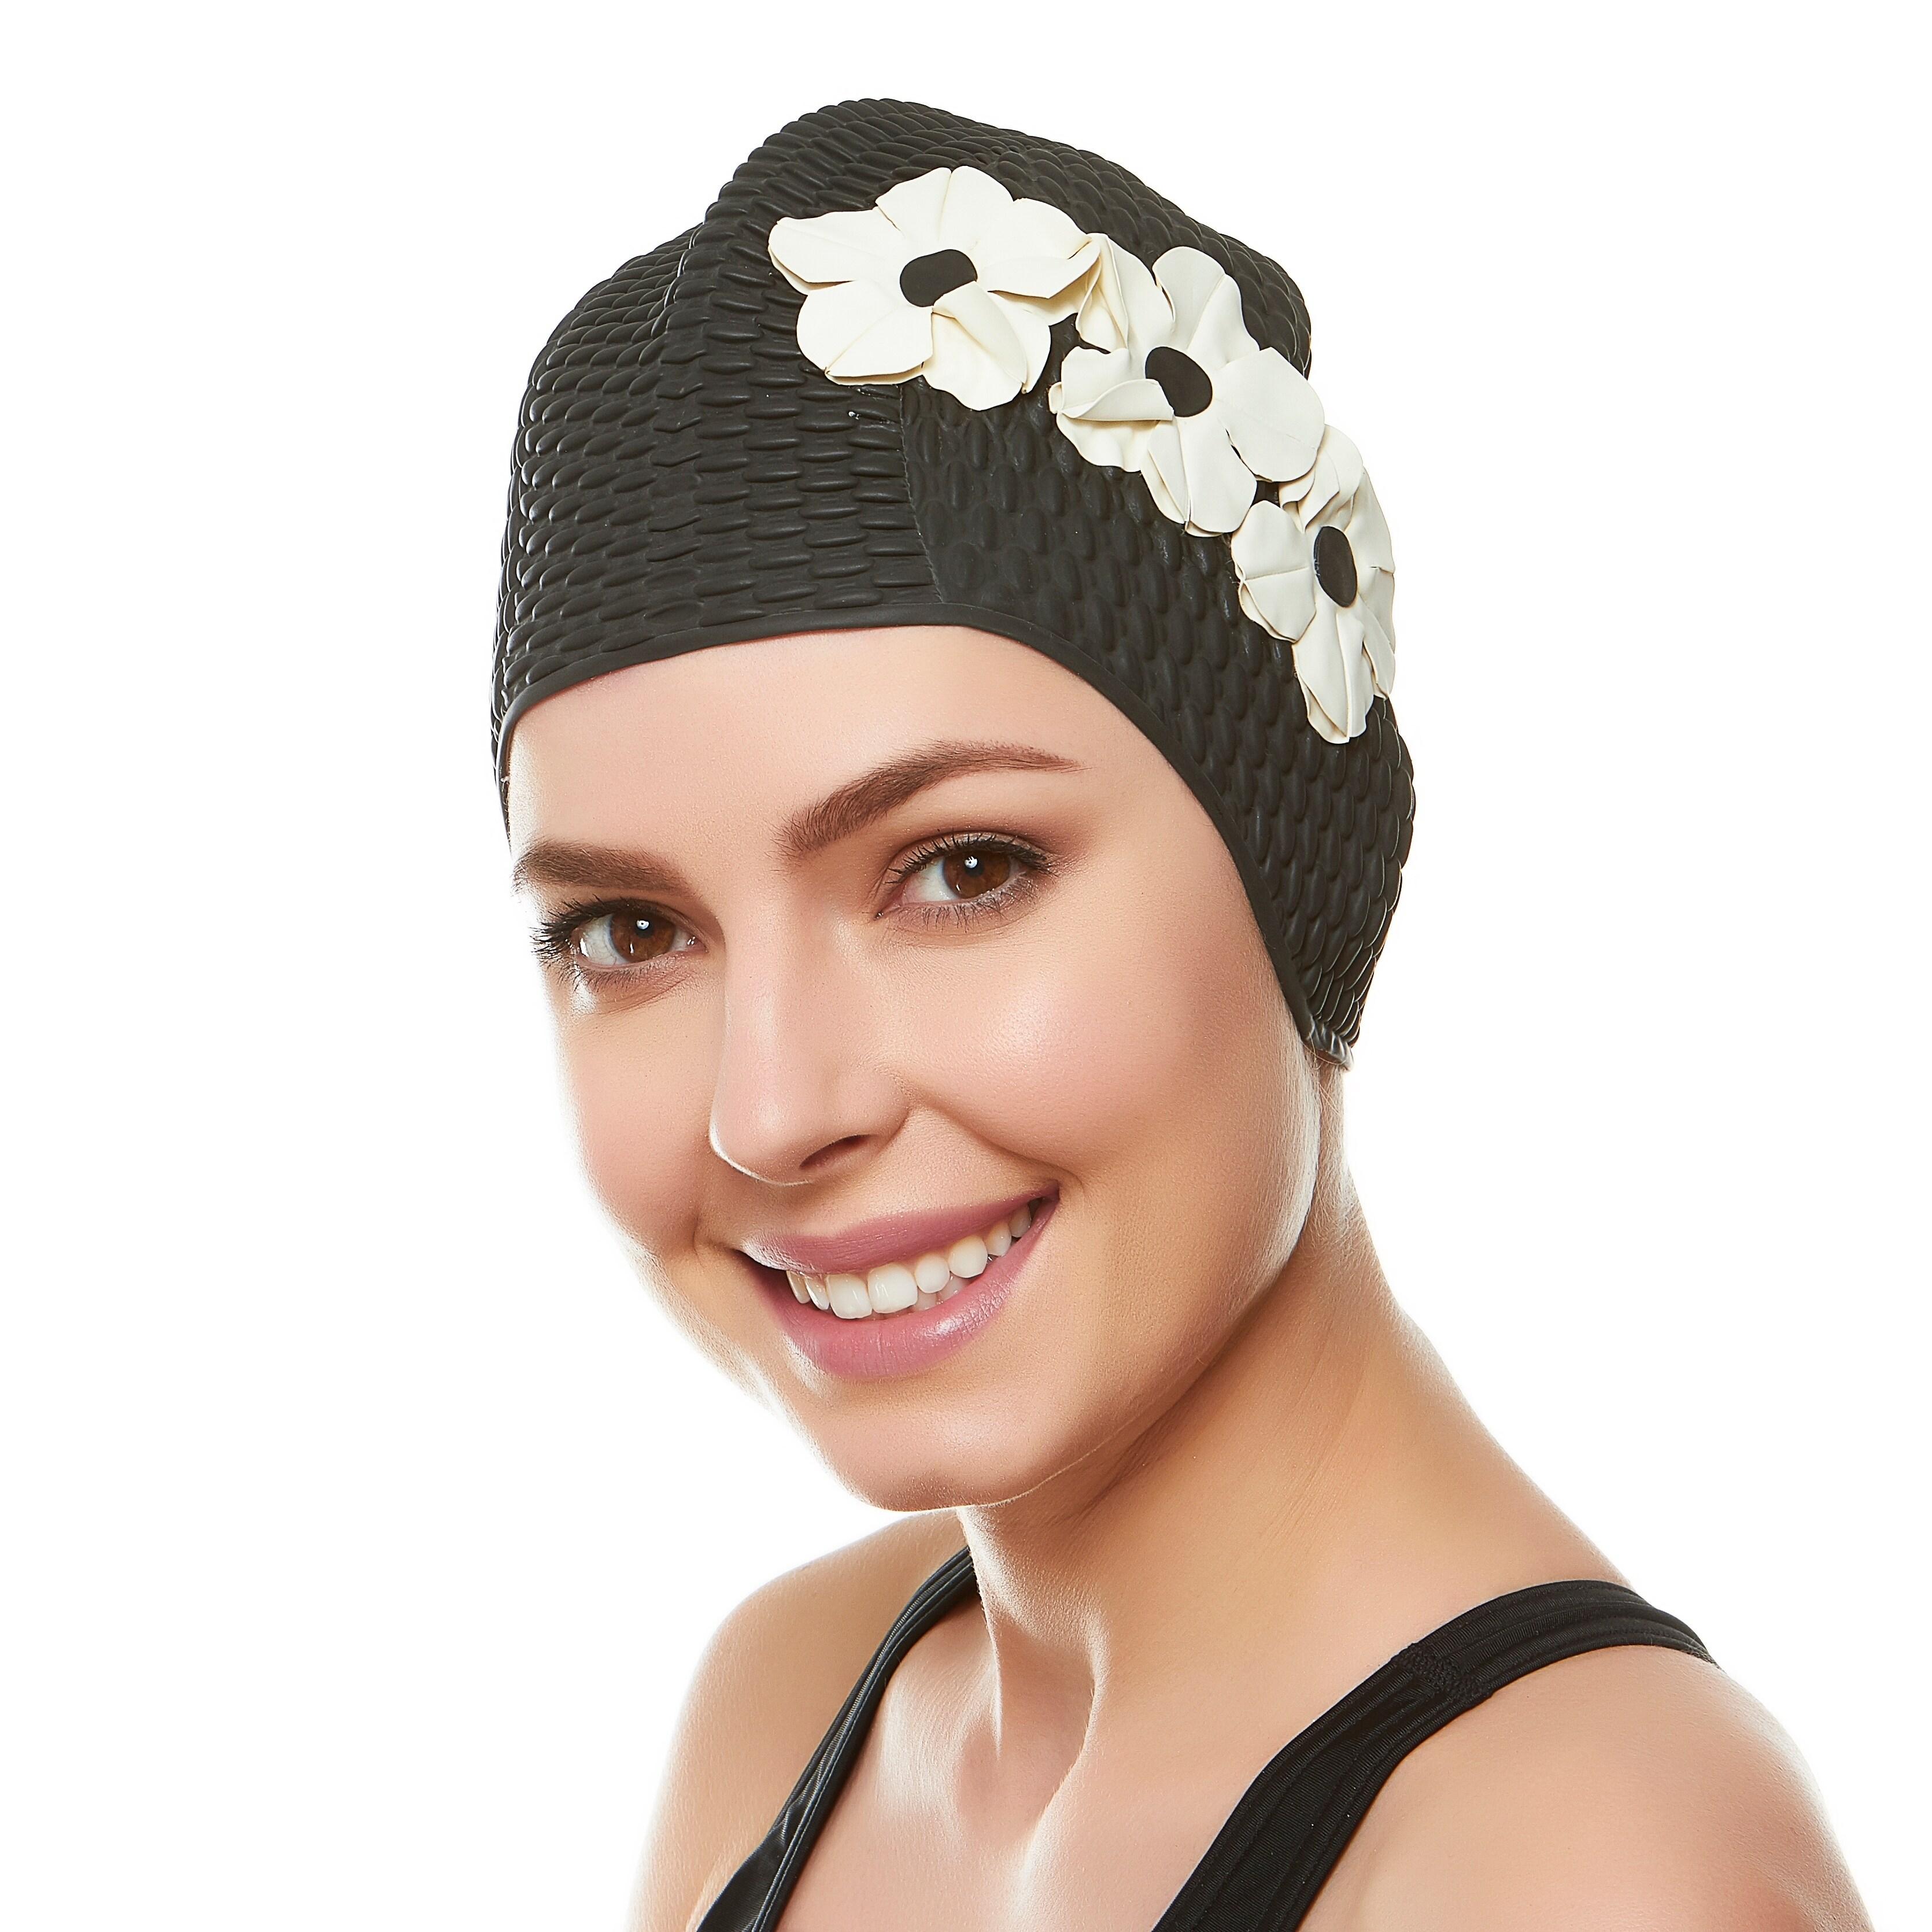 da8e724bc1b Beemo Ladies Swim Cap Latex Vintage Style Shower Bathing Waterproof  Headcovers